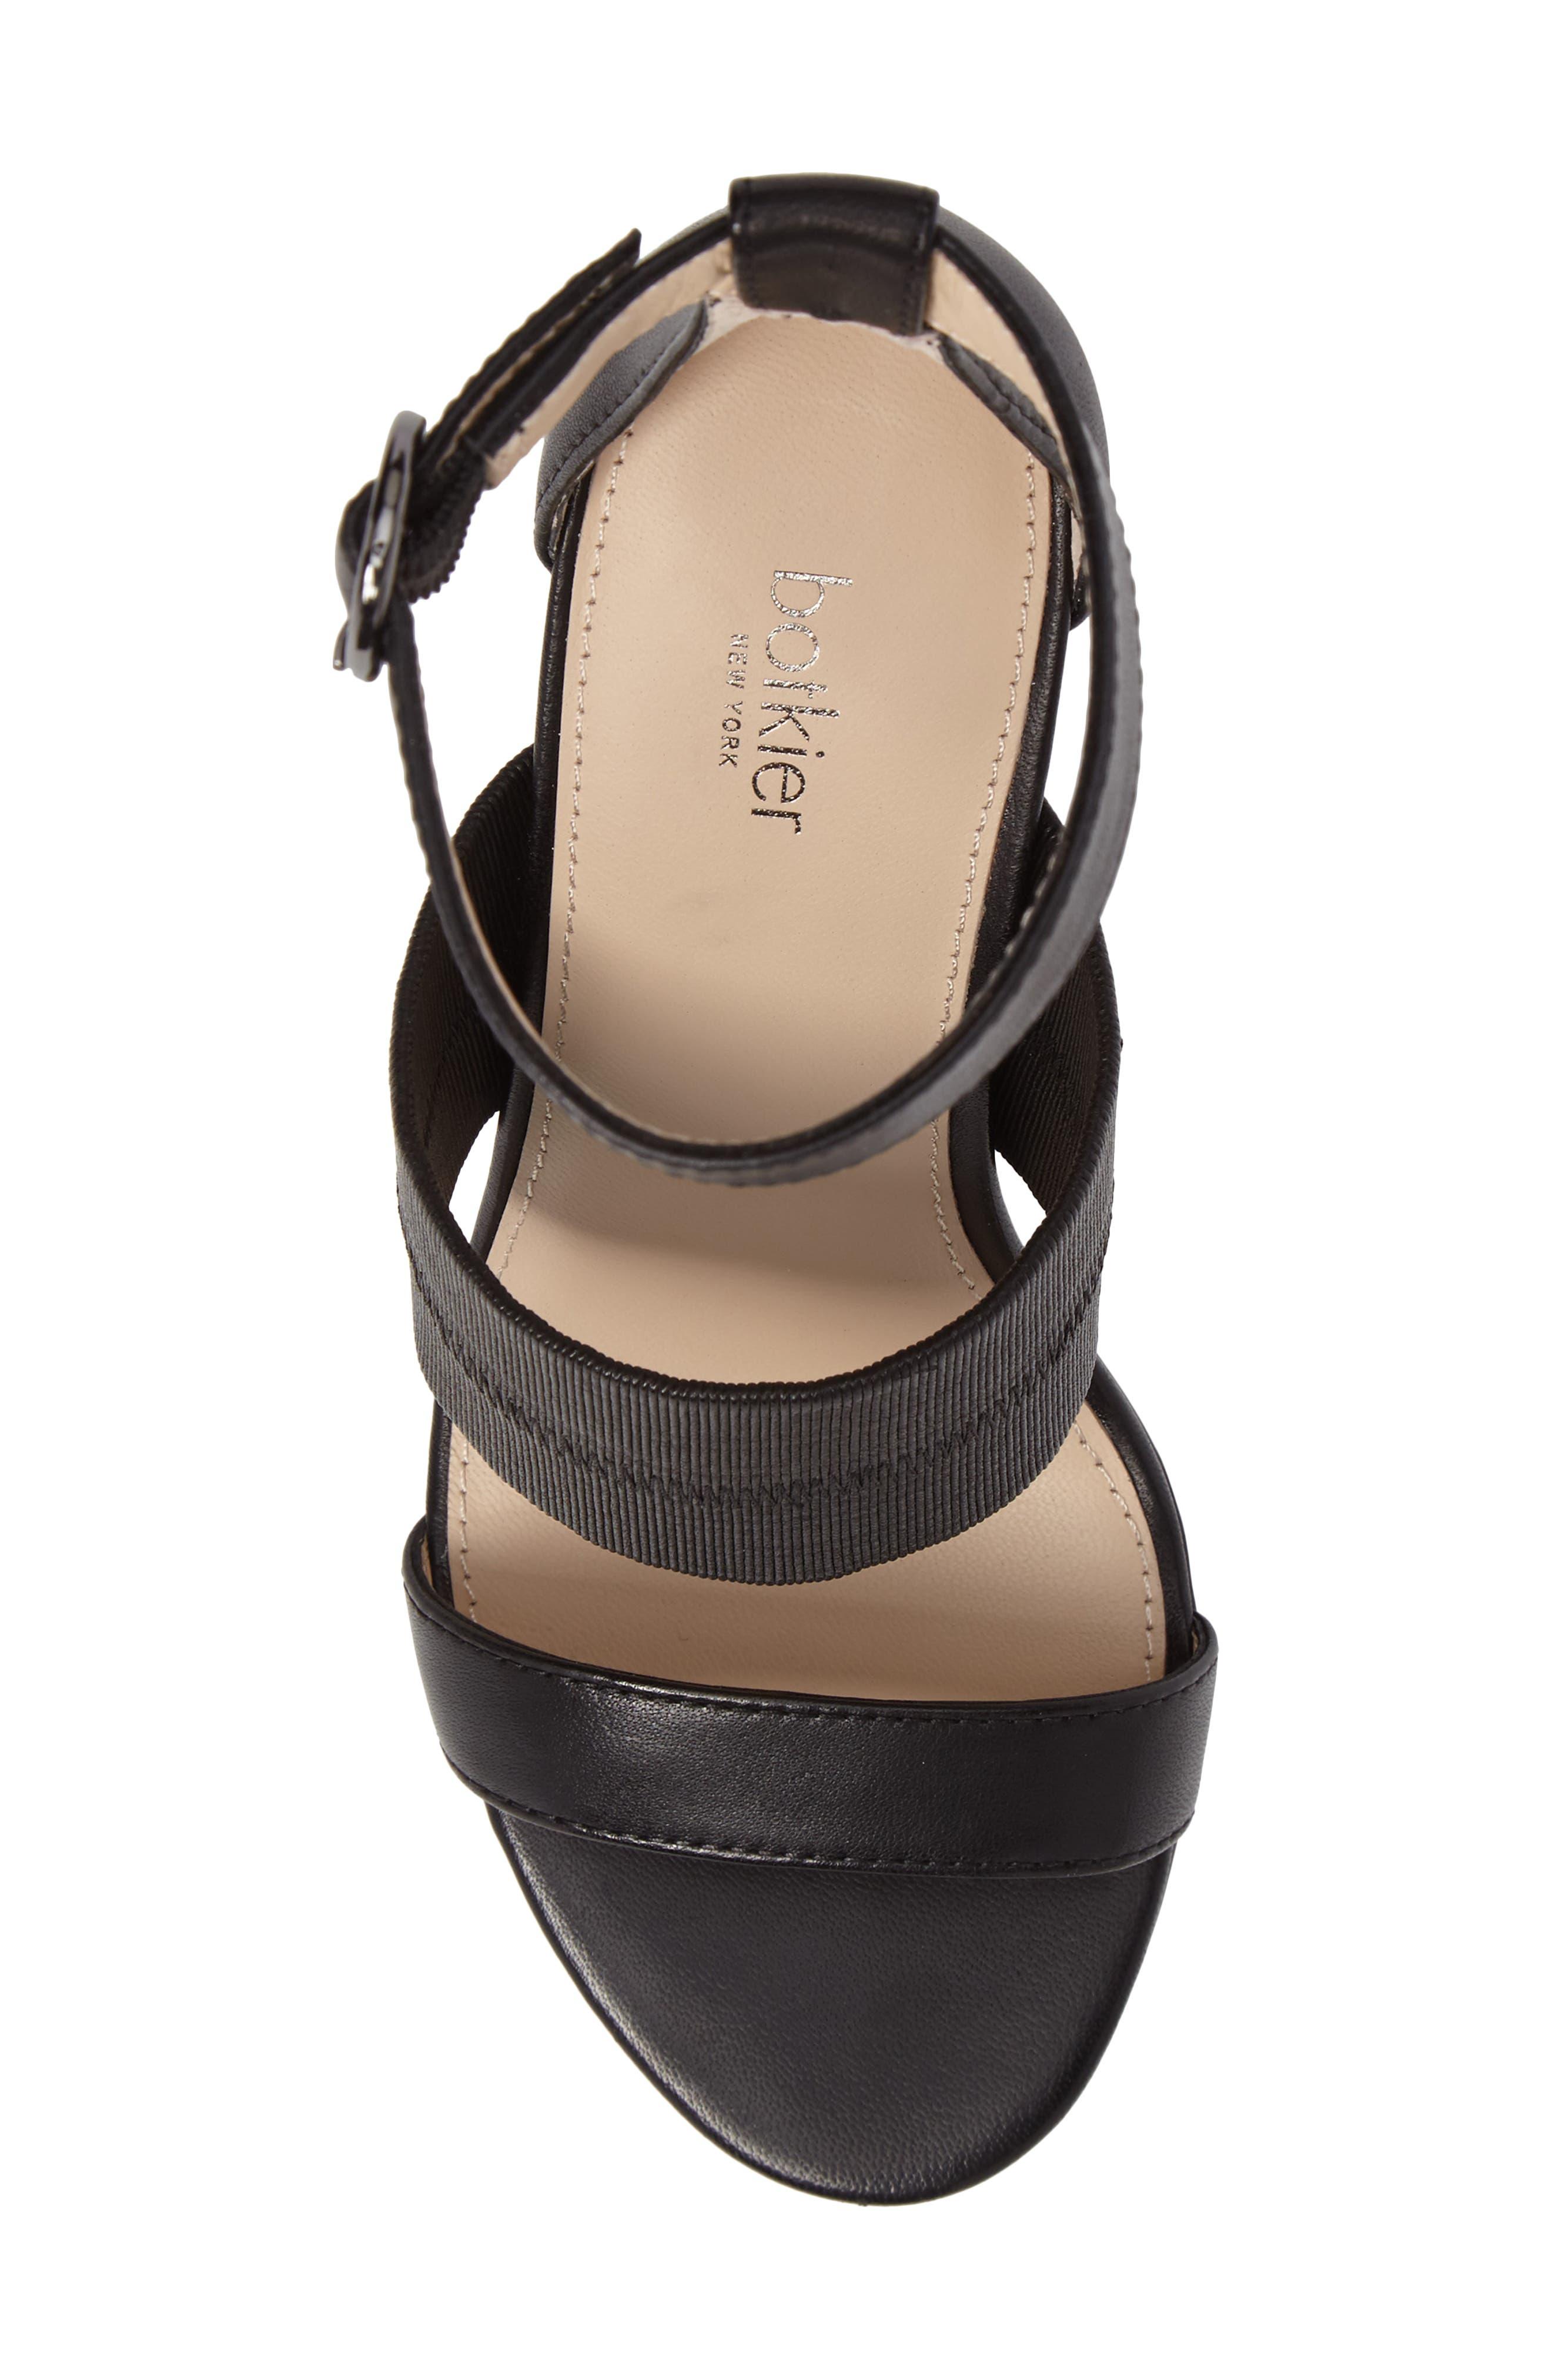 Gisella Ankle Strap Sandal,                             Alternate thumbnail 5, color,                             001